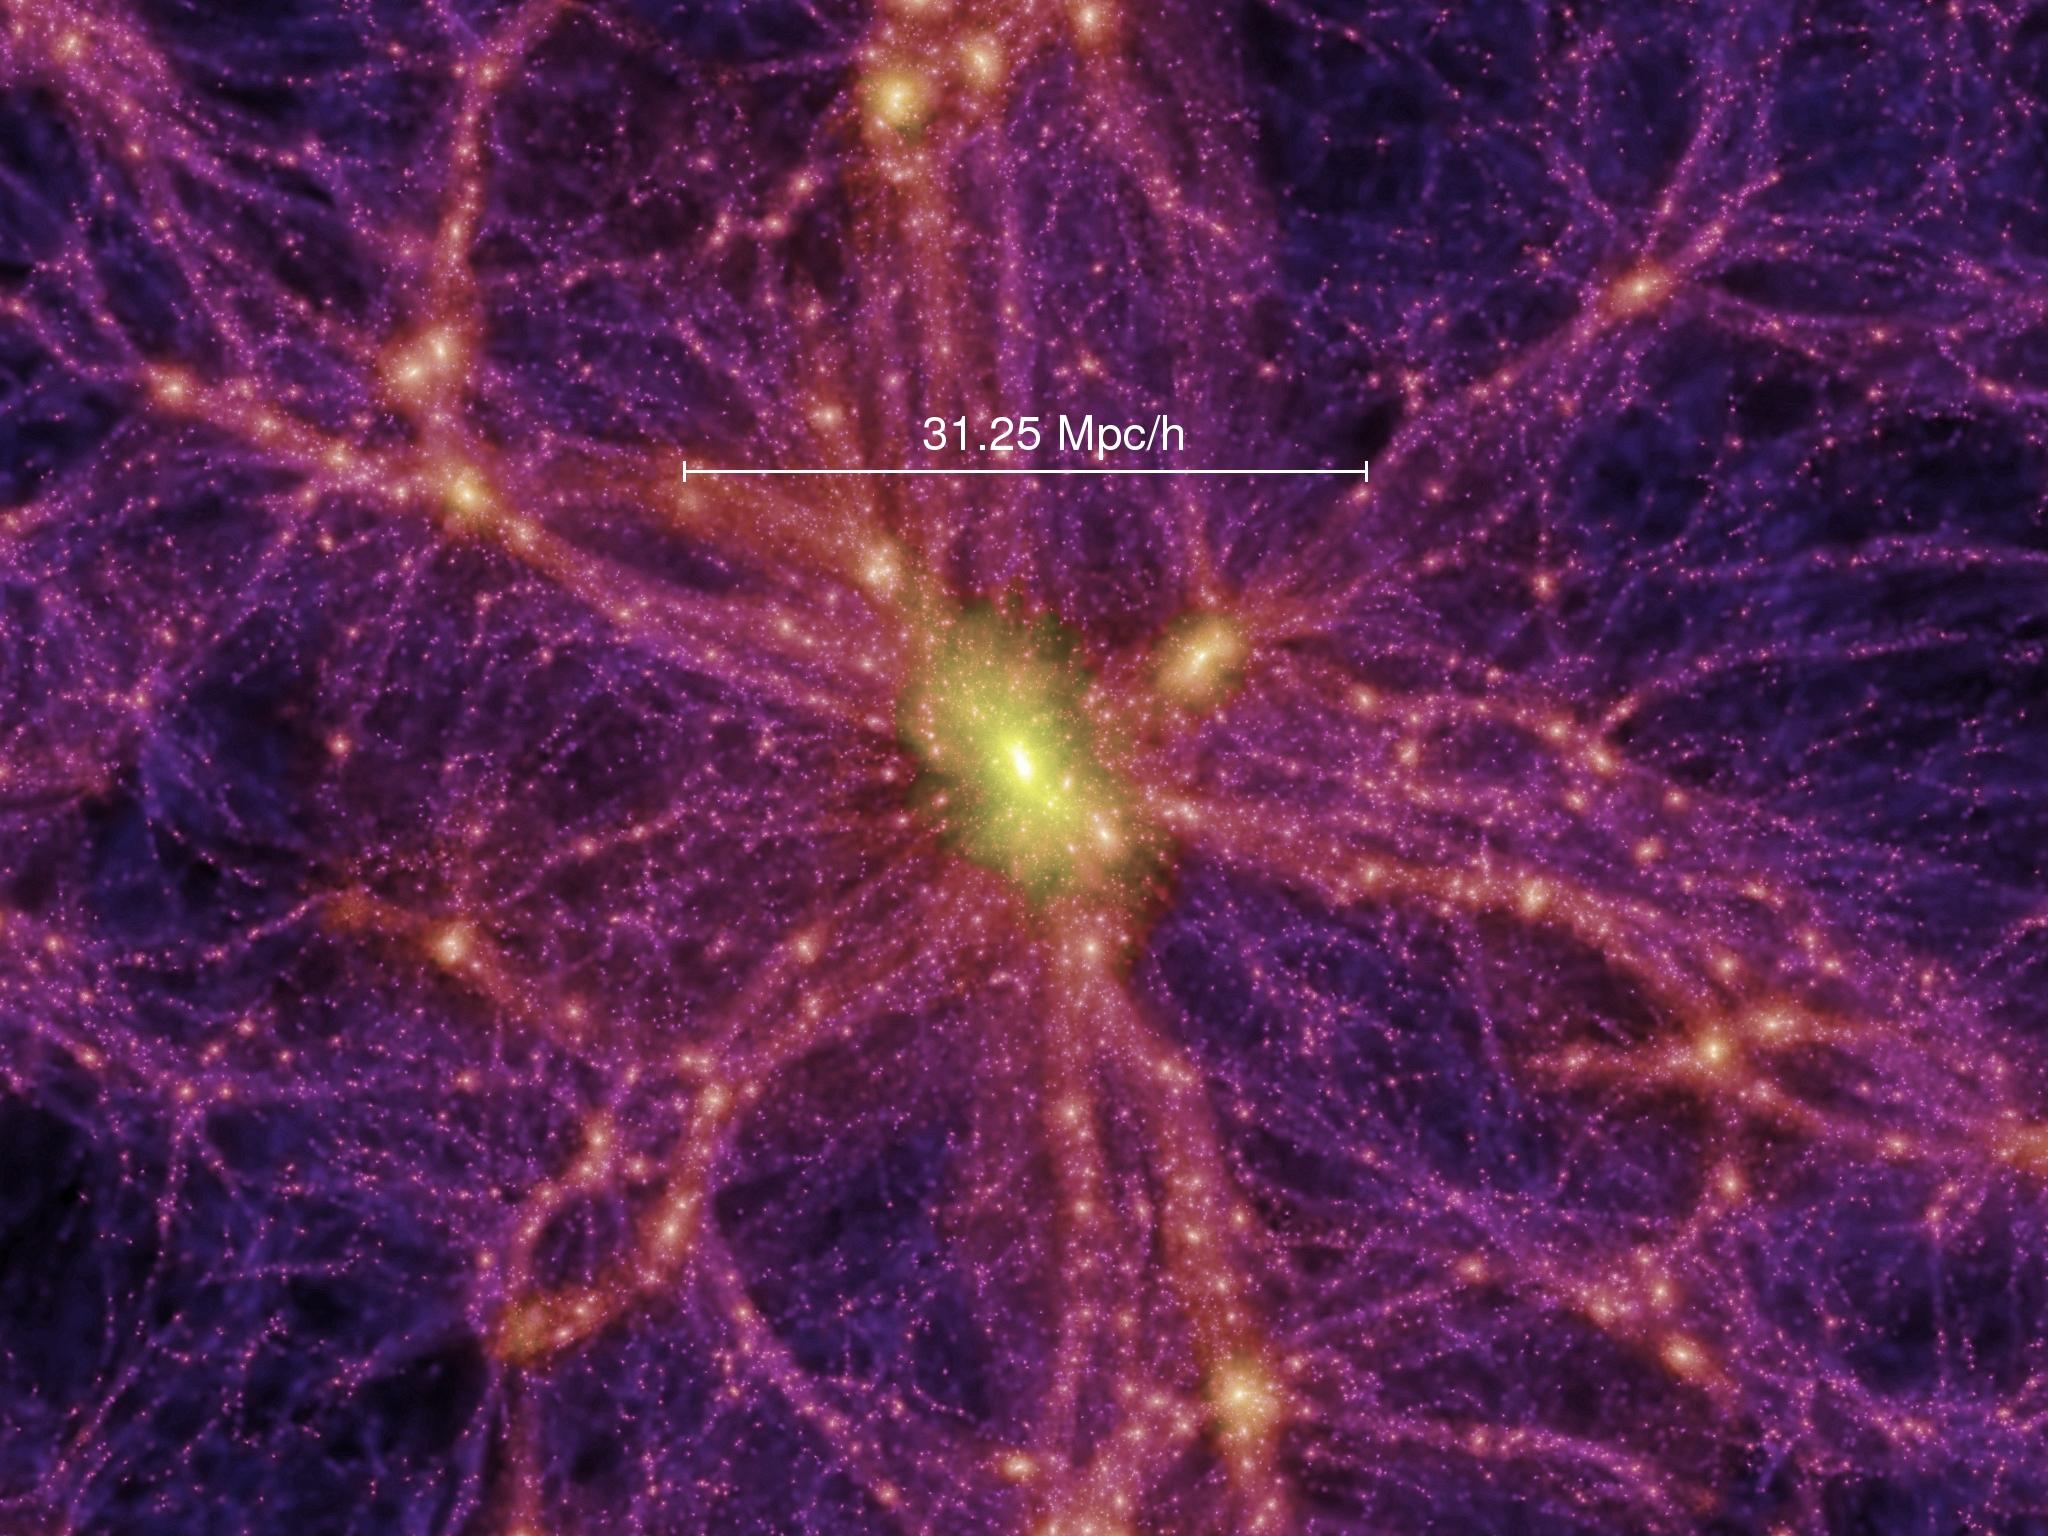 https://i2.wp.com/www.sun.org/uploads/images/Millennium_simulation_31Mpch.jpg